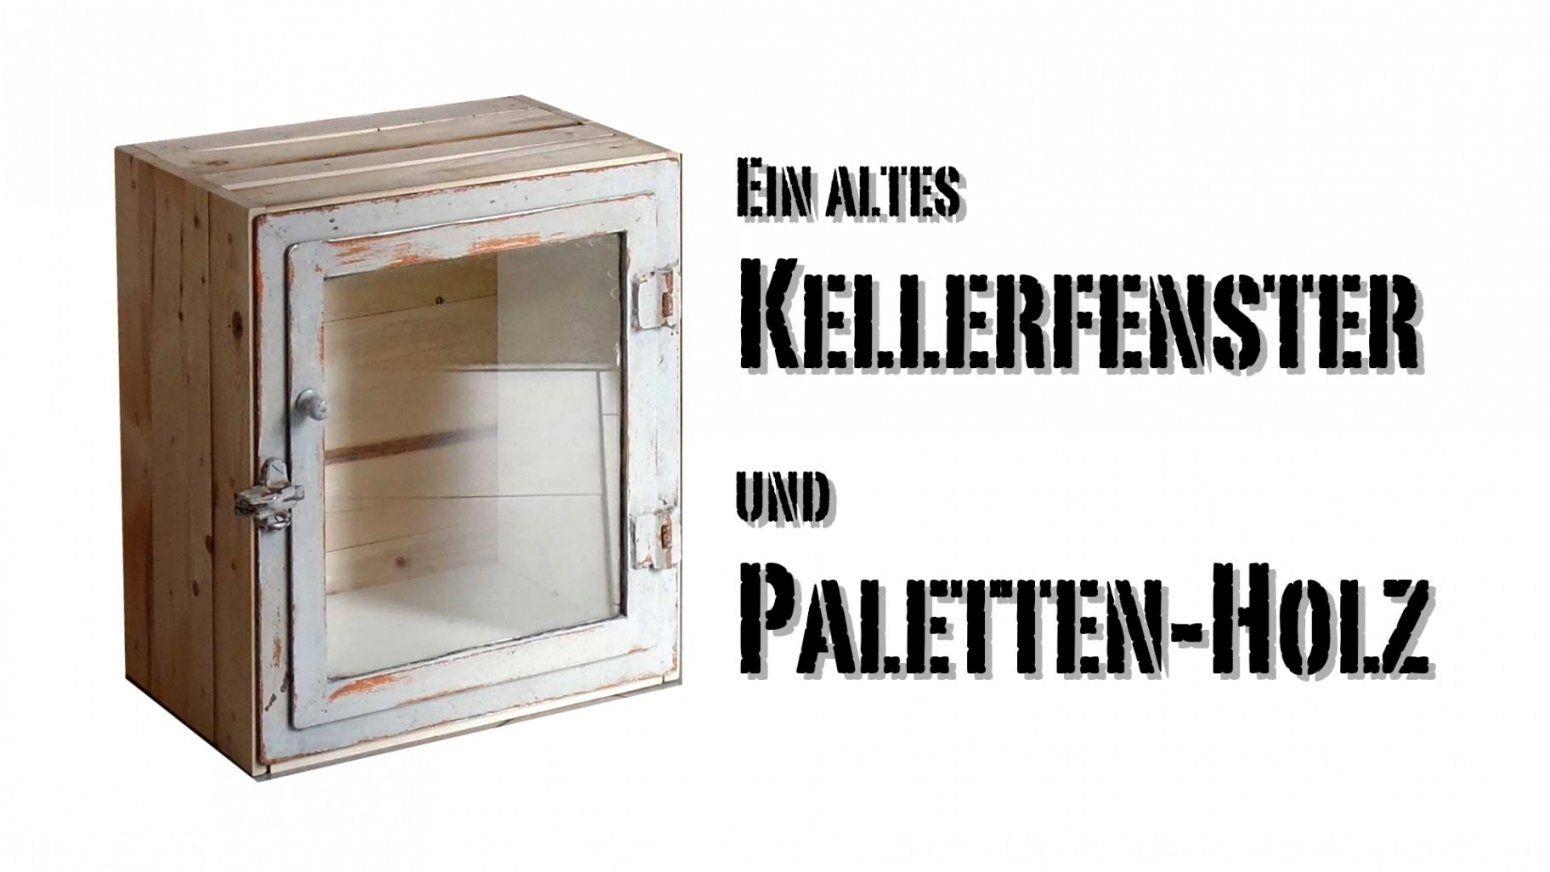 Interessant Schrank Selber Bauen Anleitung Schön Begehbarer von Vitrine Selber Bauen Anleitung Photo